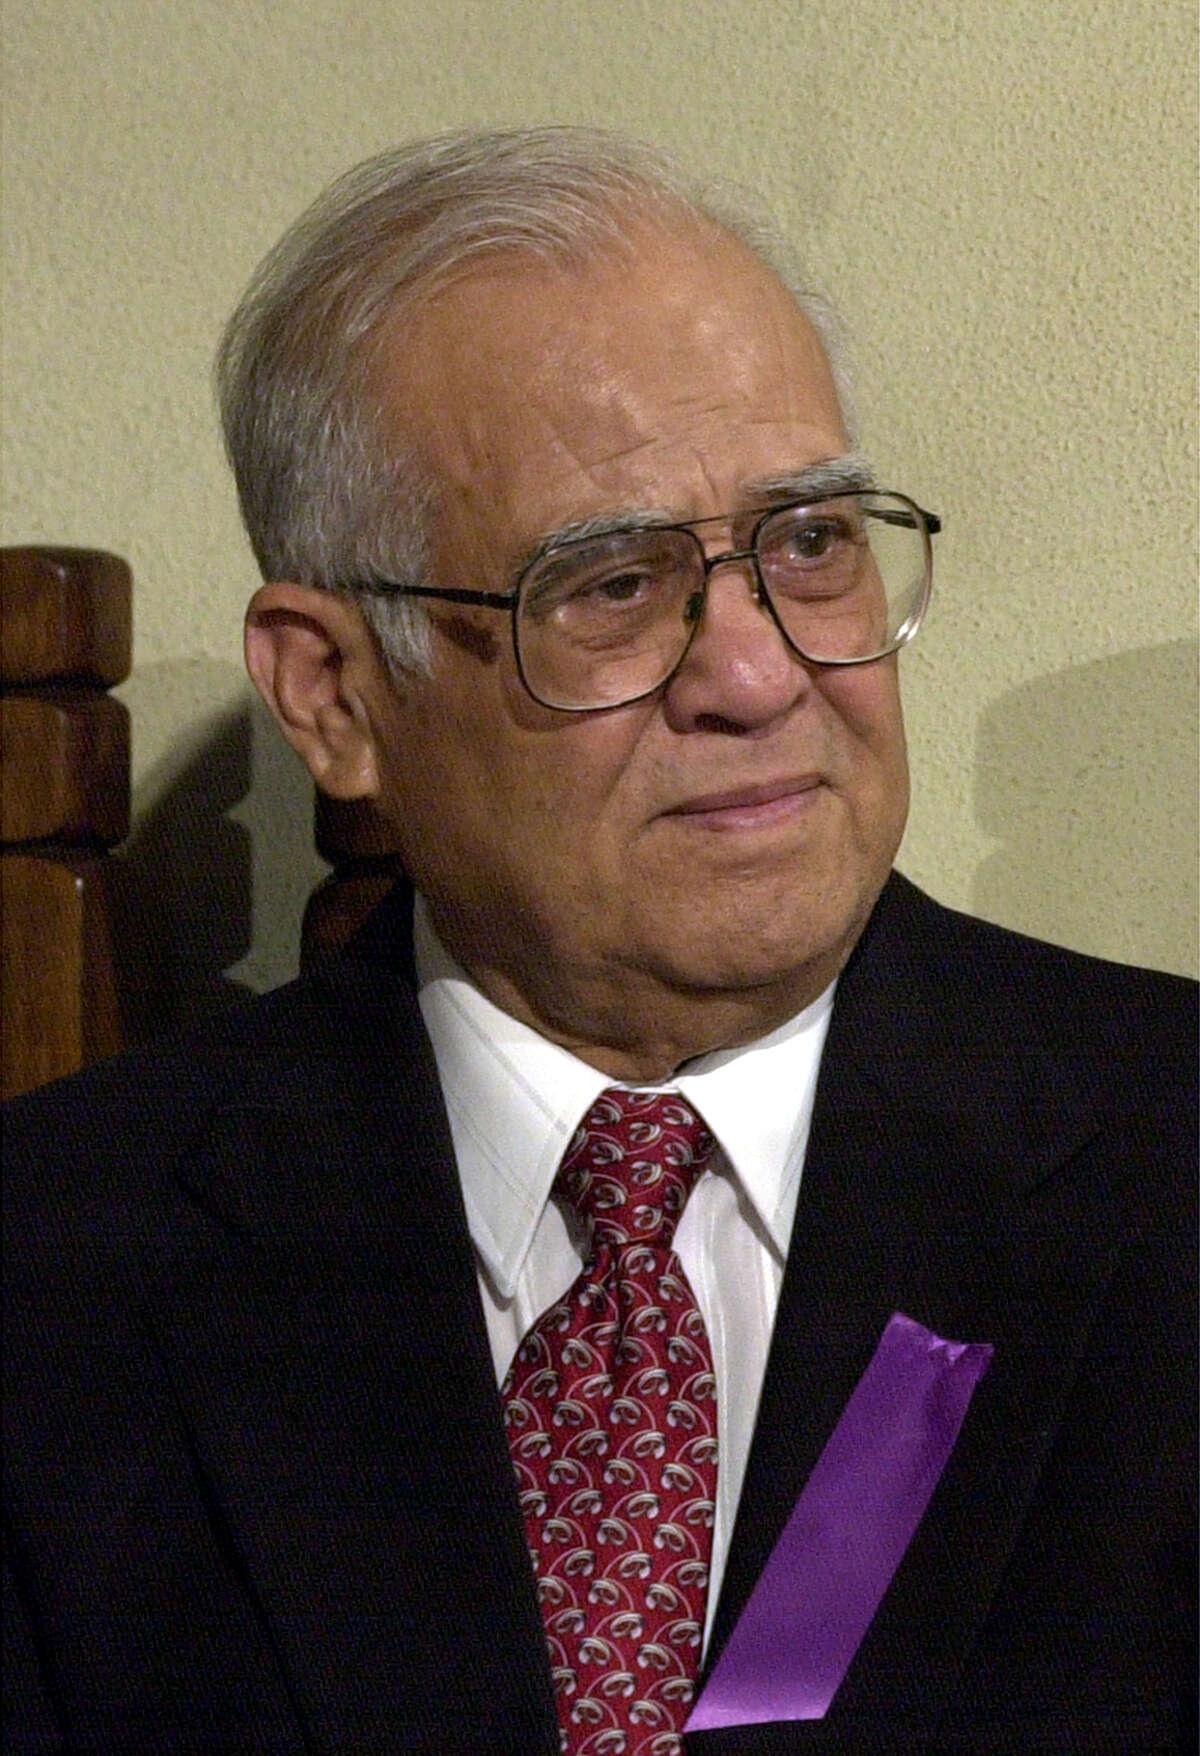 A file photo of Former Congressman E. Kika De la Garza when he attended the funeral mass for Henry B. Gonzalez at San Fernado Catedral. STAFF/ GLORIA FERNIZ